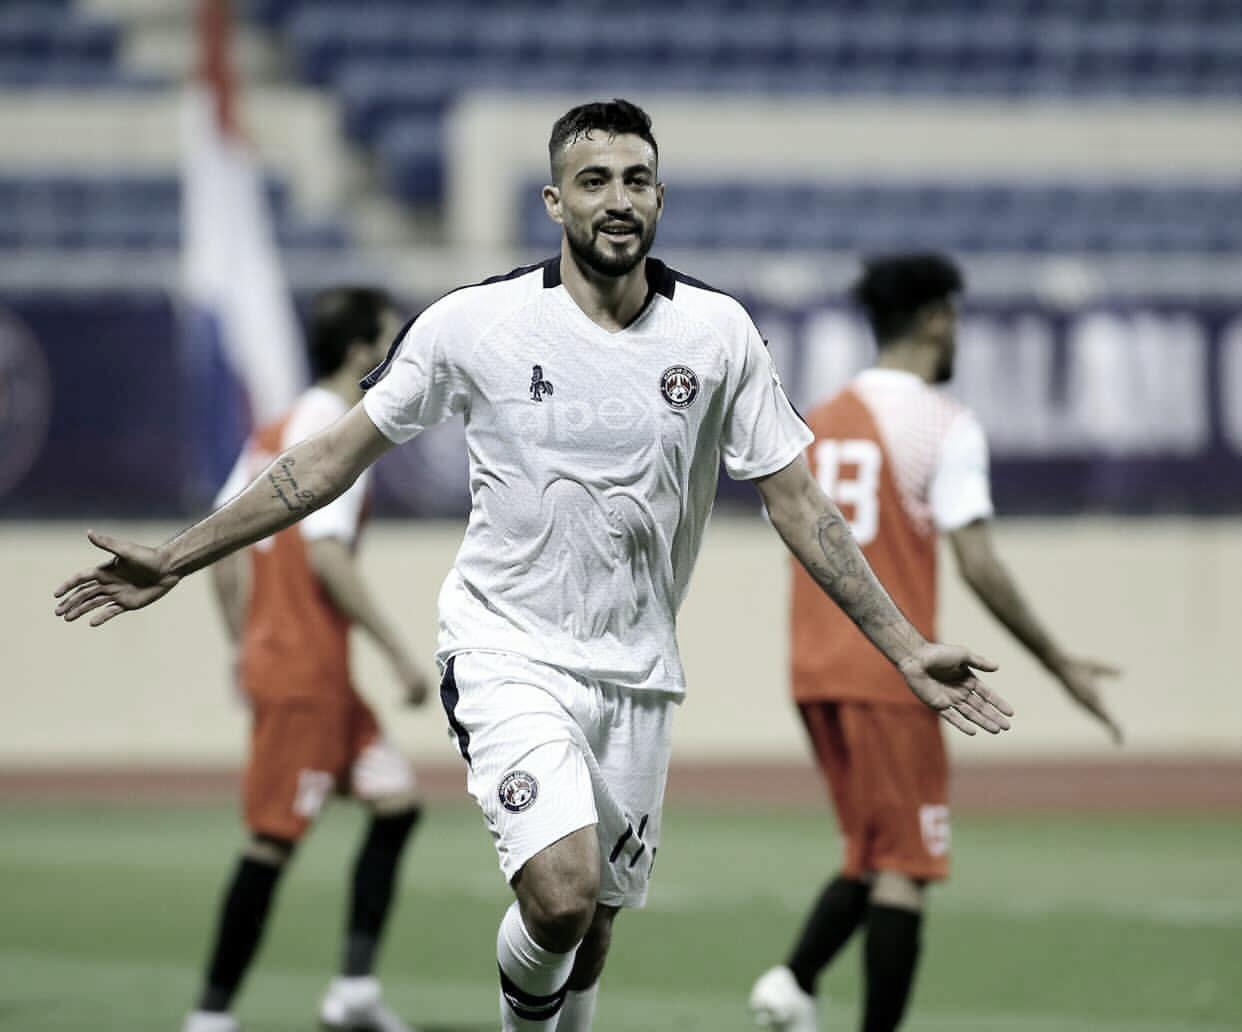 Everton destaca fase positiva no Al Adalah e comenta reta final da temporada